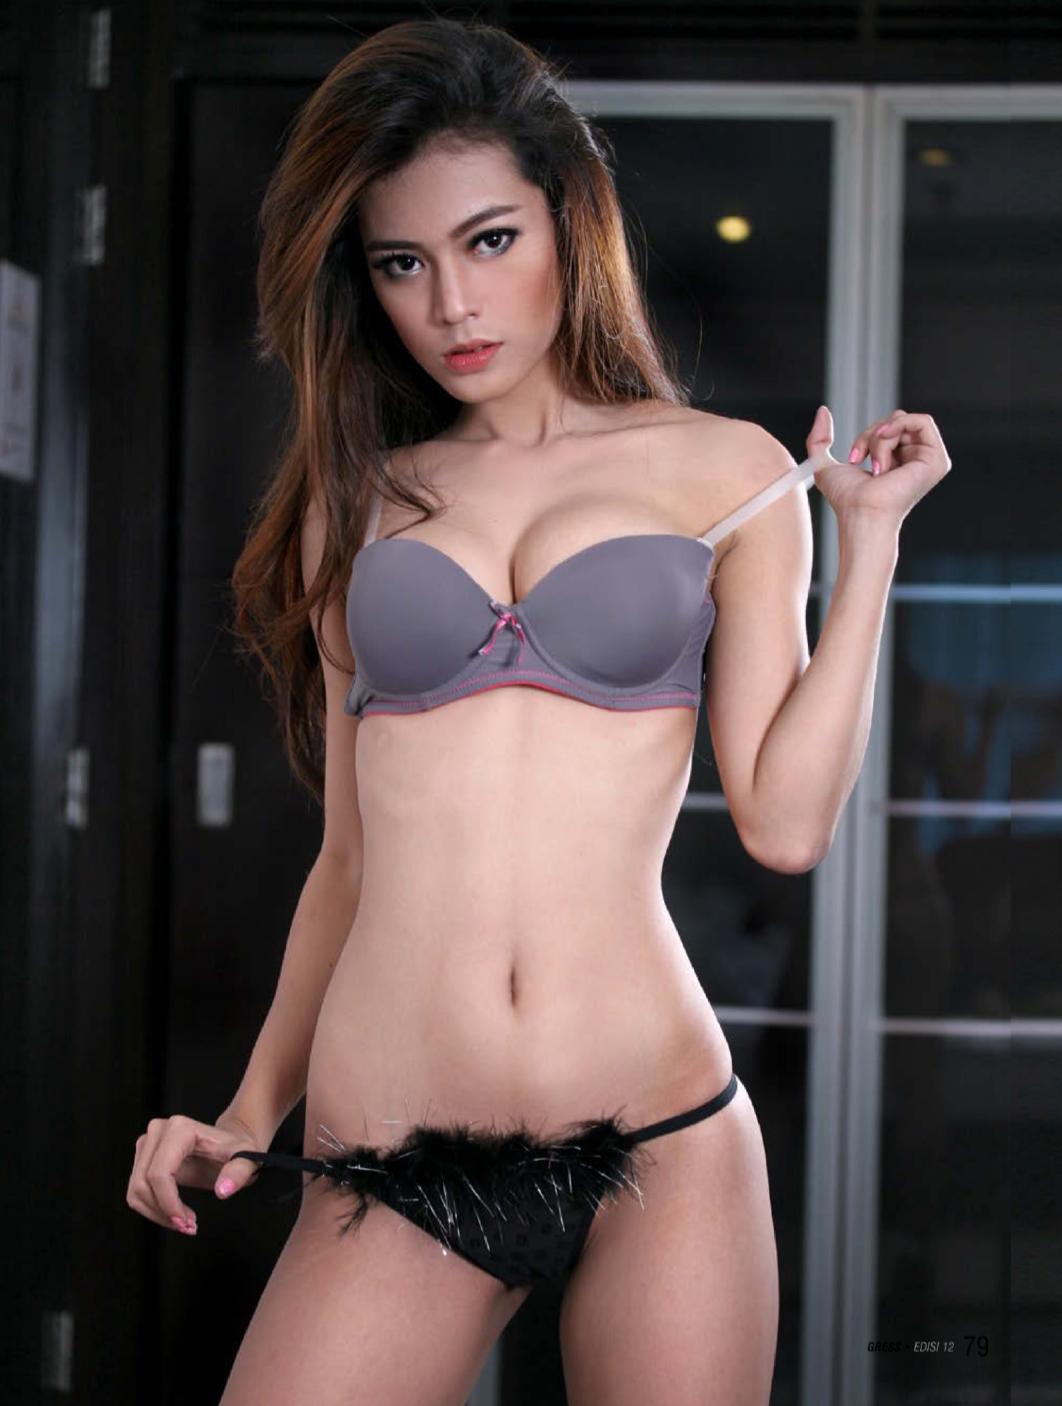 model seksi hot koleksi foto super hot seksi vera indah